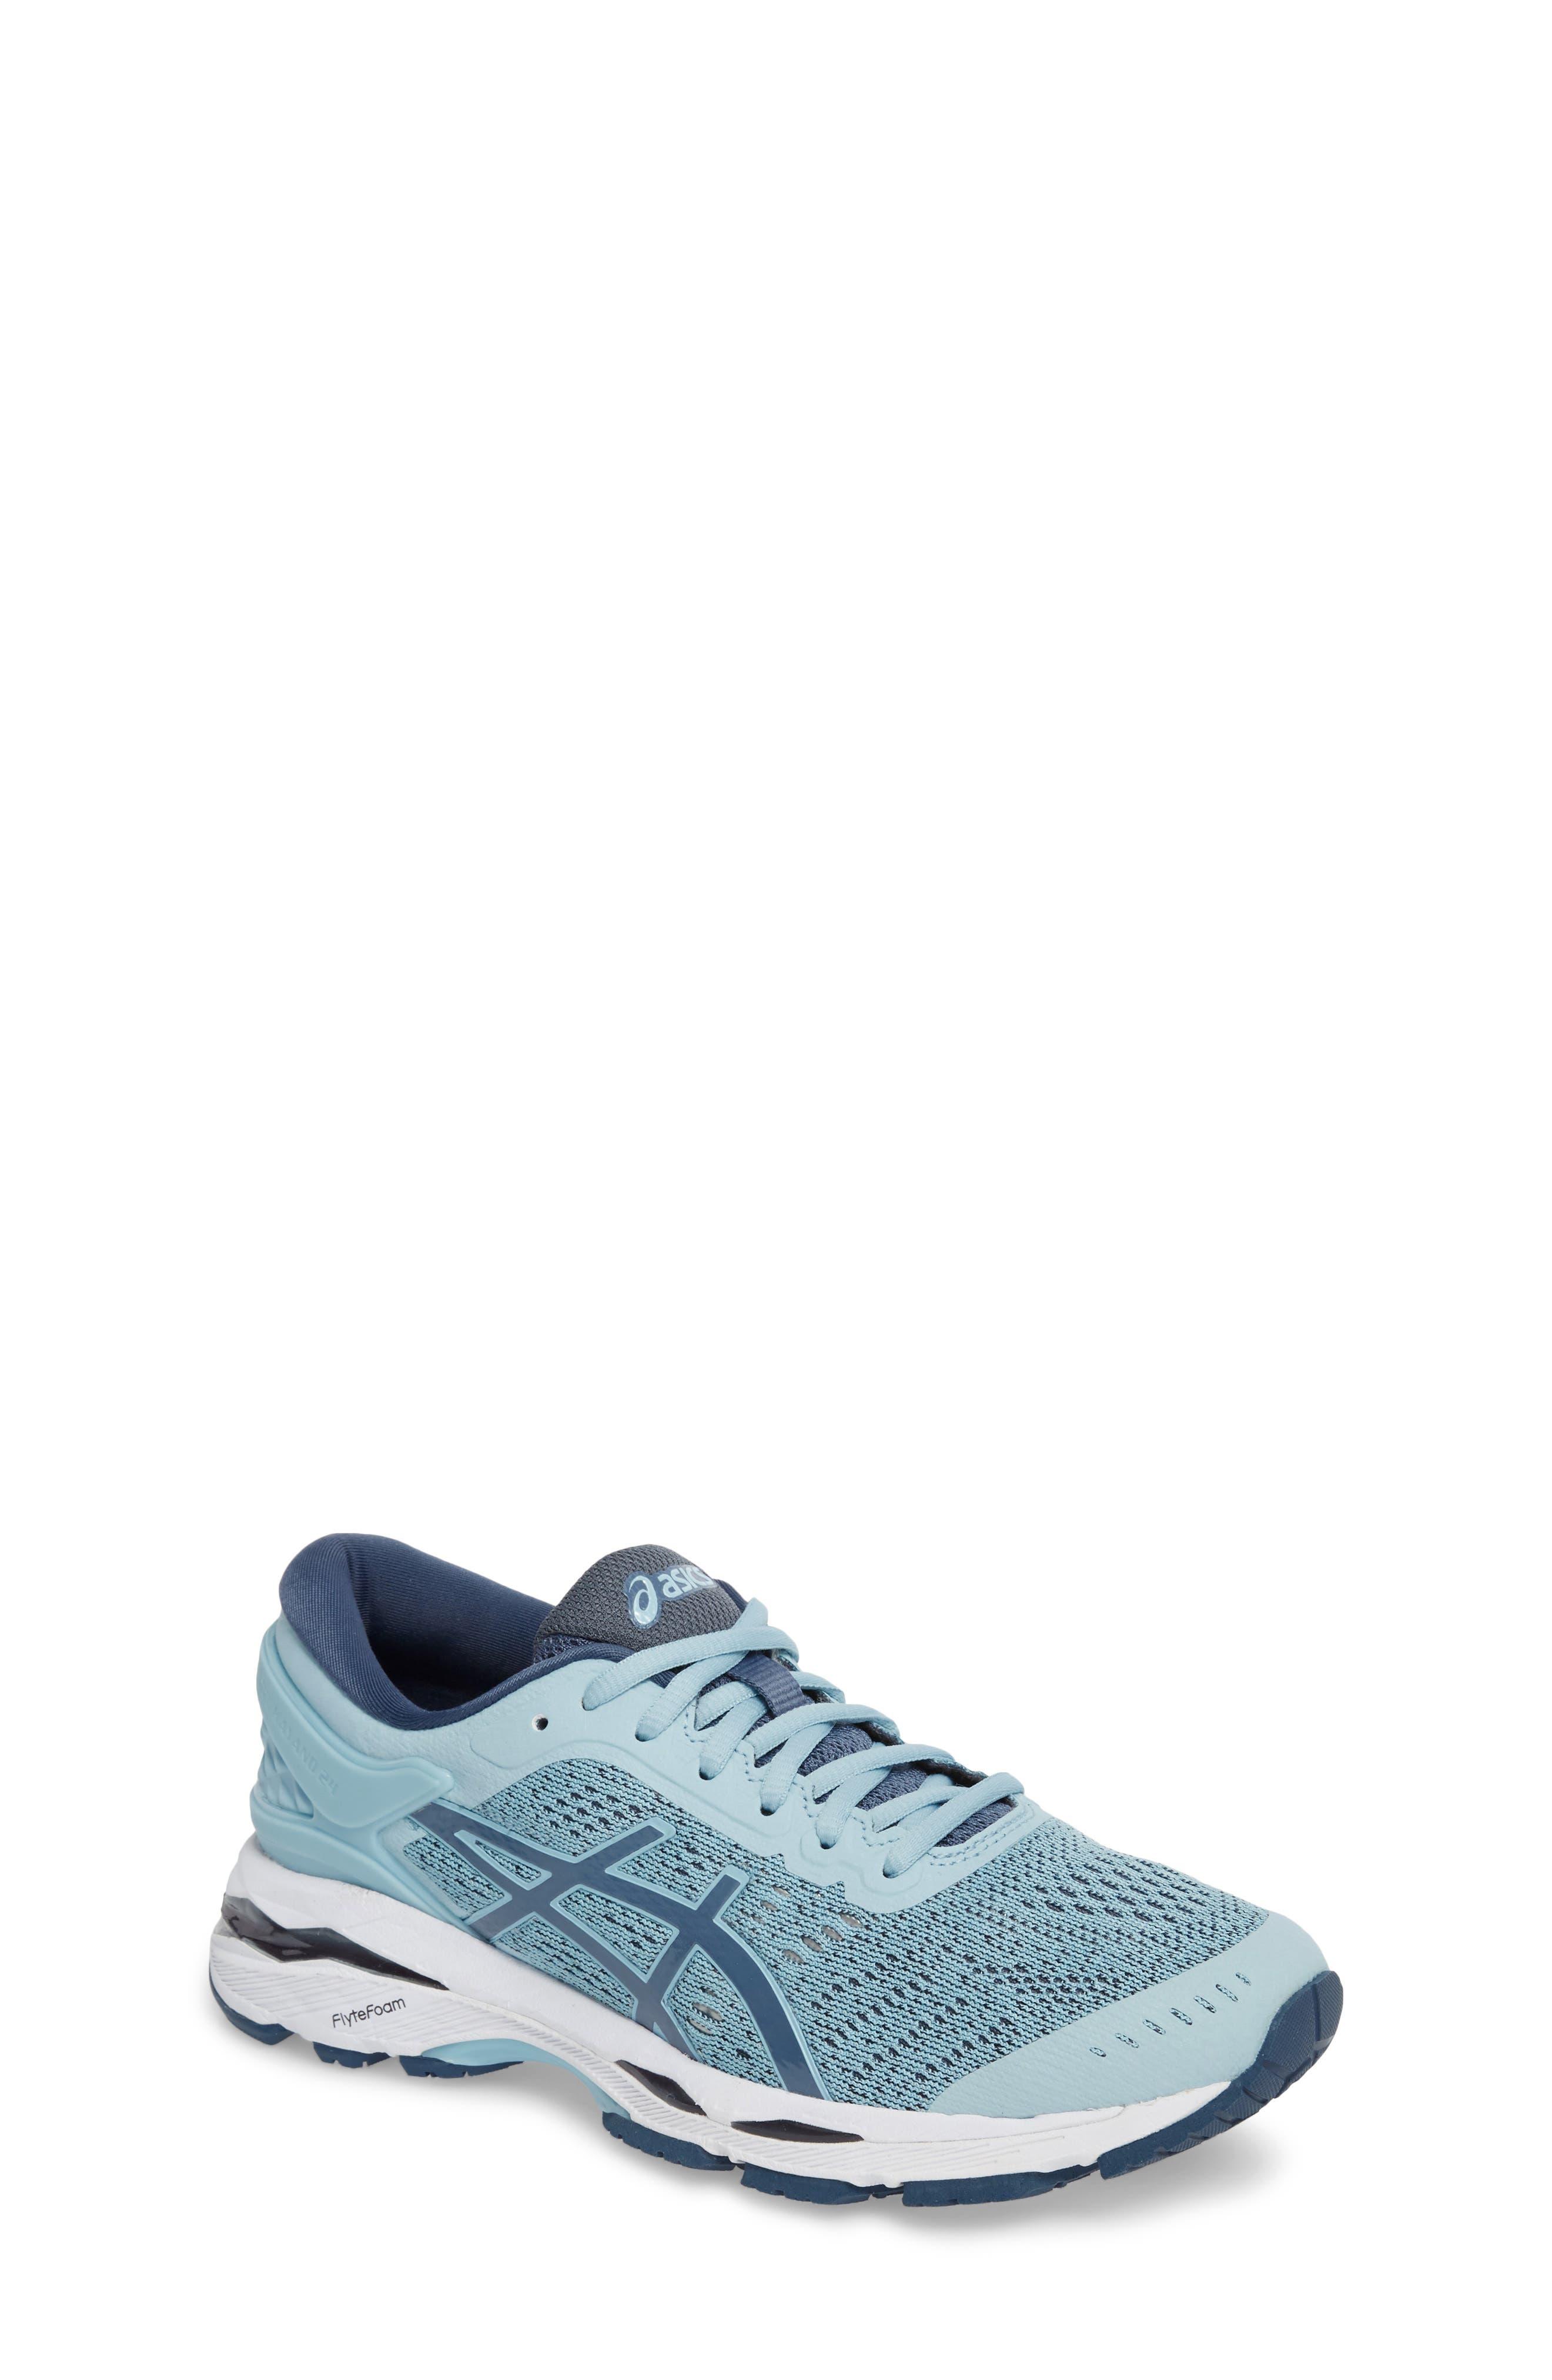 GEL-Kayano<sup>®</sup> 24 GS Running Shoe,                             Main thumbnail 2, color,